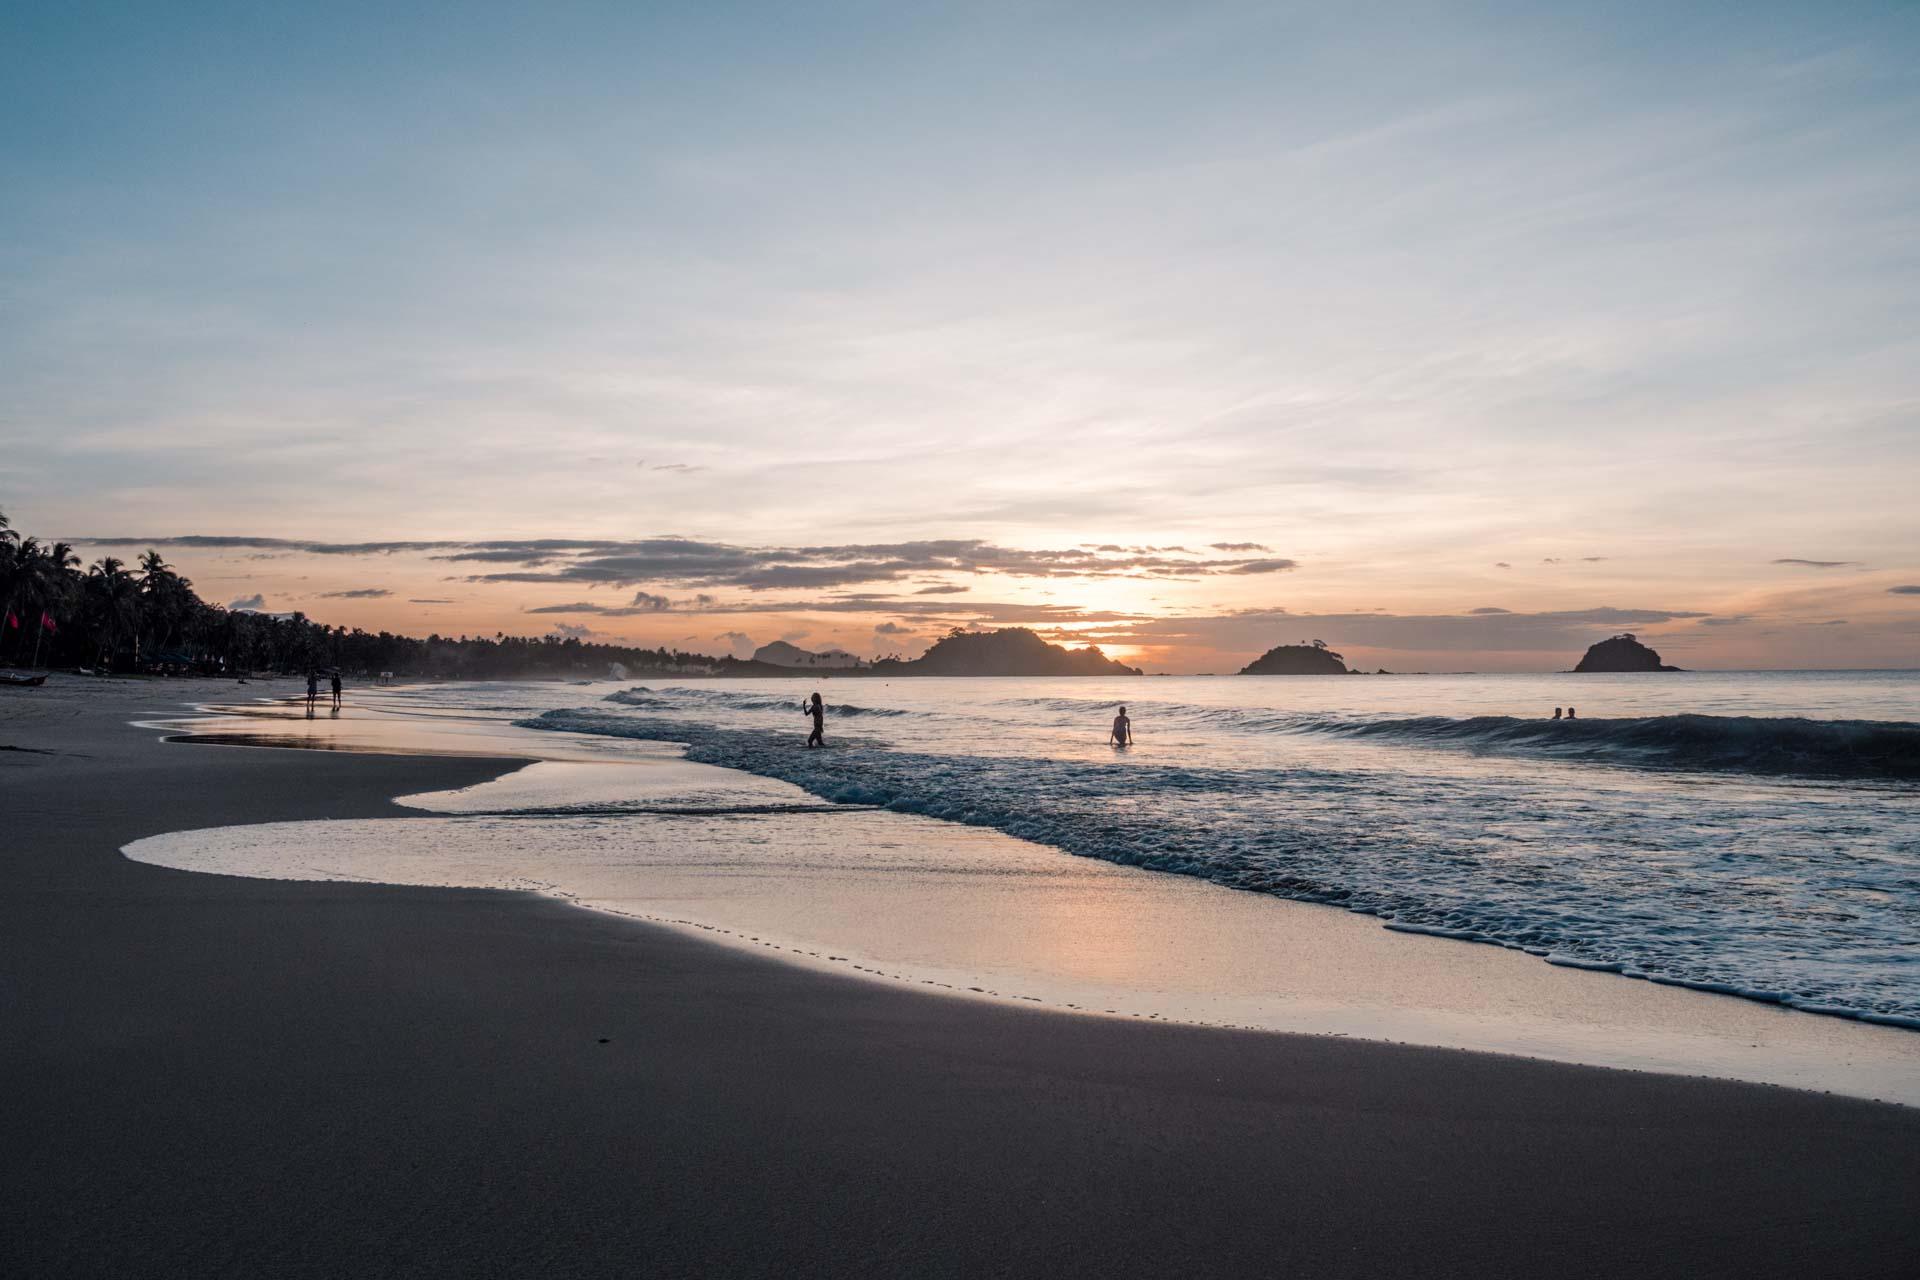 Nacpan Beach at sunset